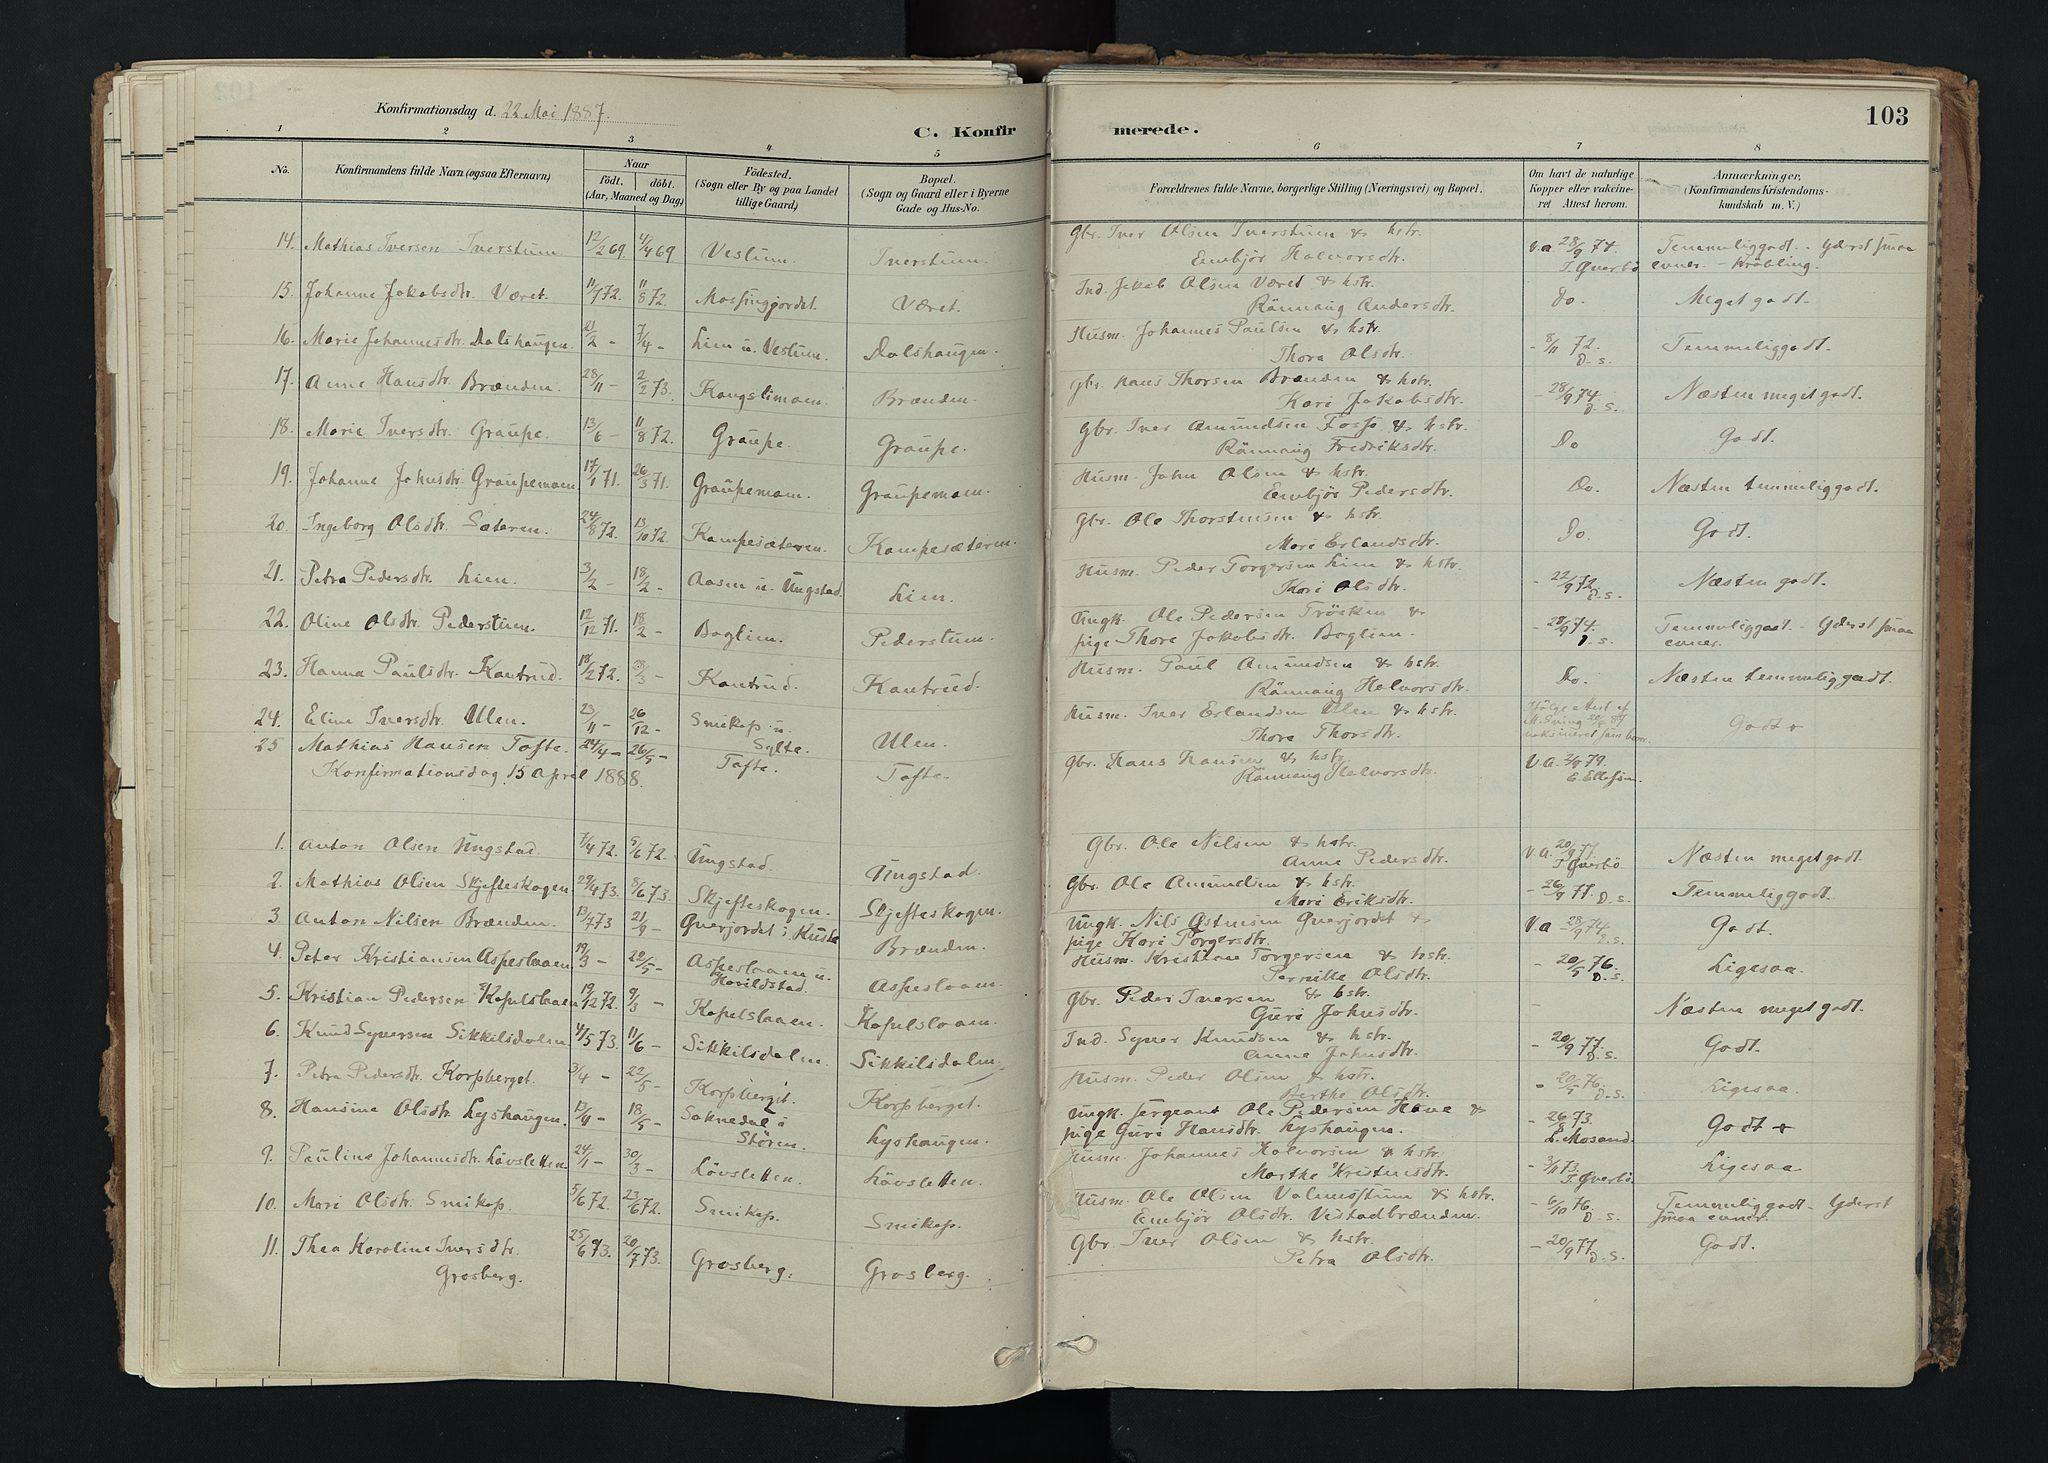 SAH, Nord-Fron prestekontor, Ministerialbok nr. 5, 1884-1914, s. 103